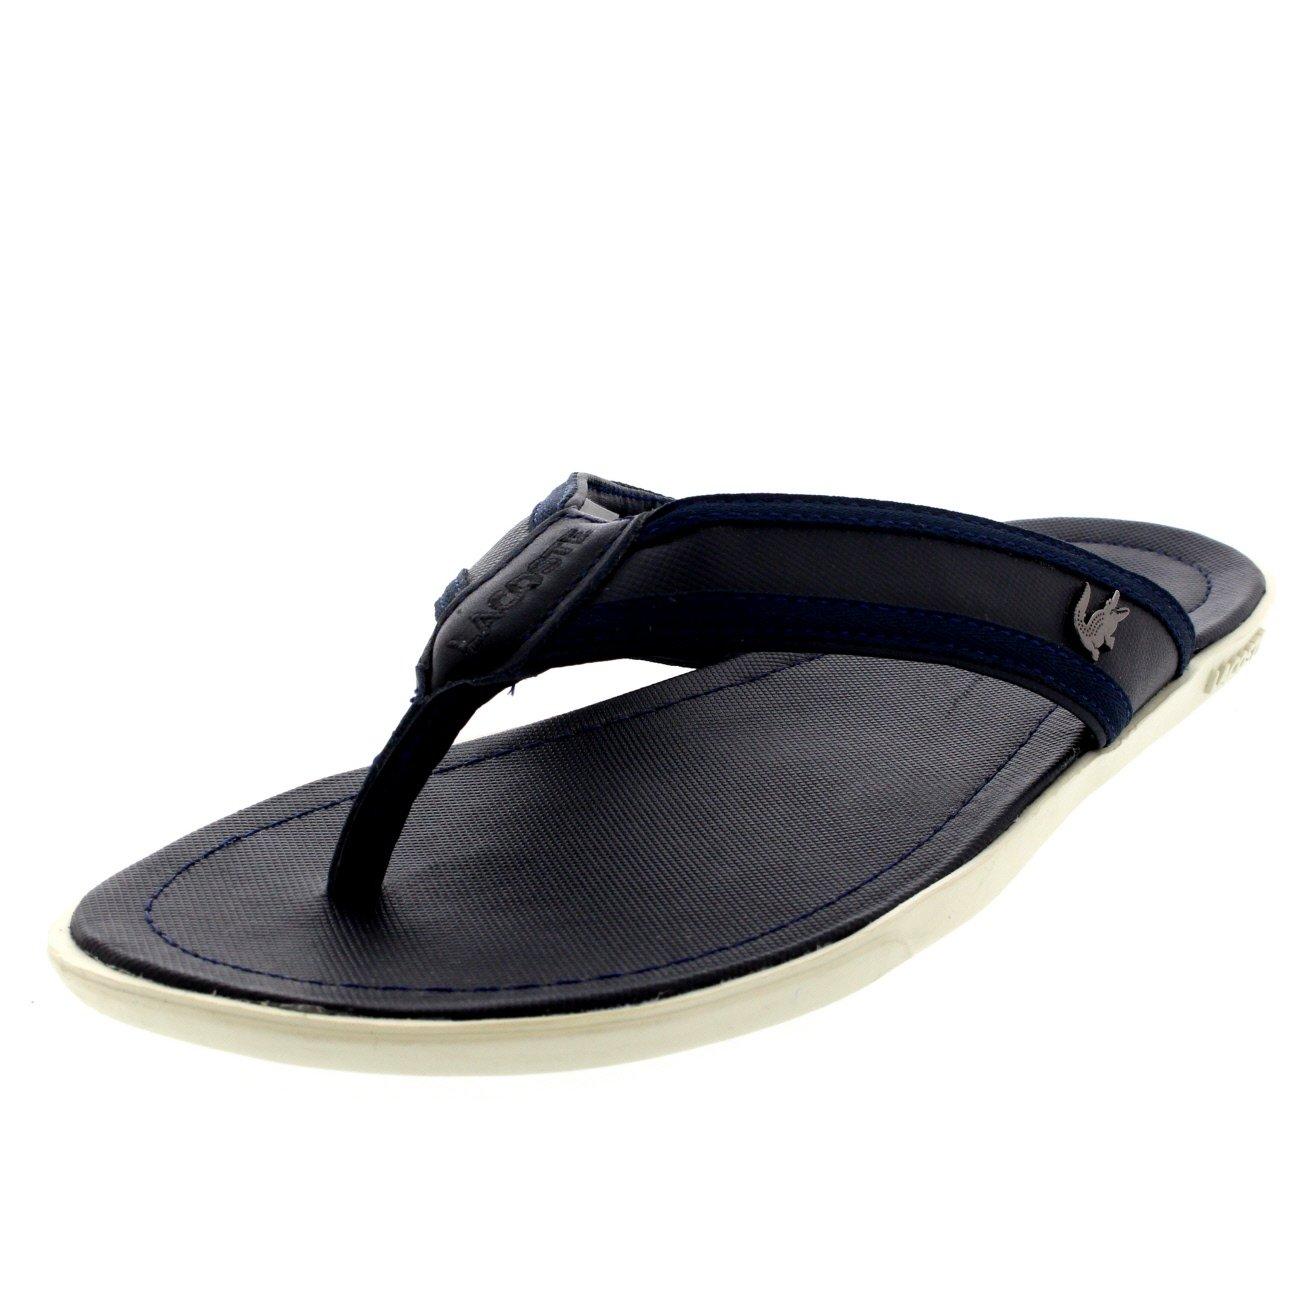 55d06adcfc91 Mens Lacoste Carros 6 Leather Fabric Vacation Flip Flops Beach Sandals -  Dark Blue - 13  Amazon.ca  Shoes   Handbags